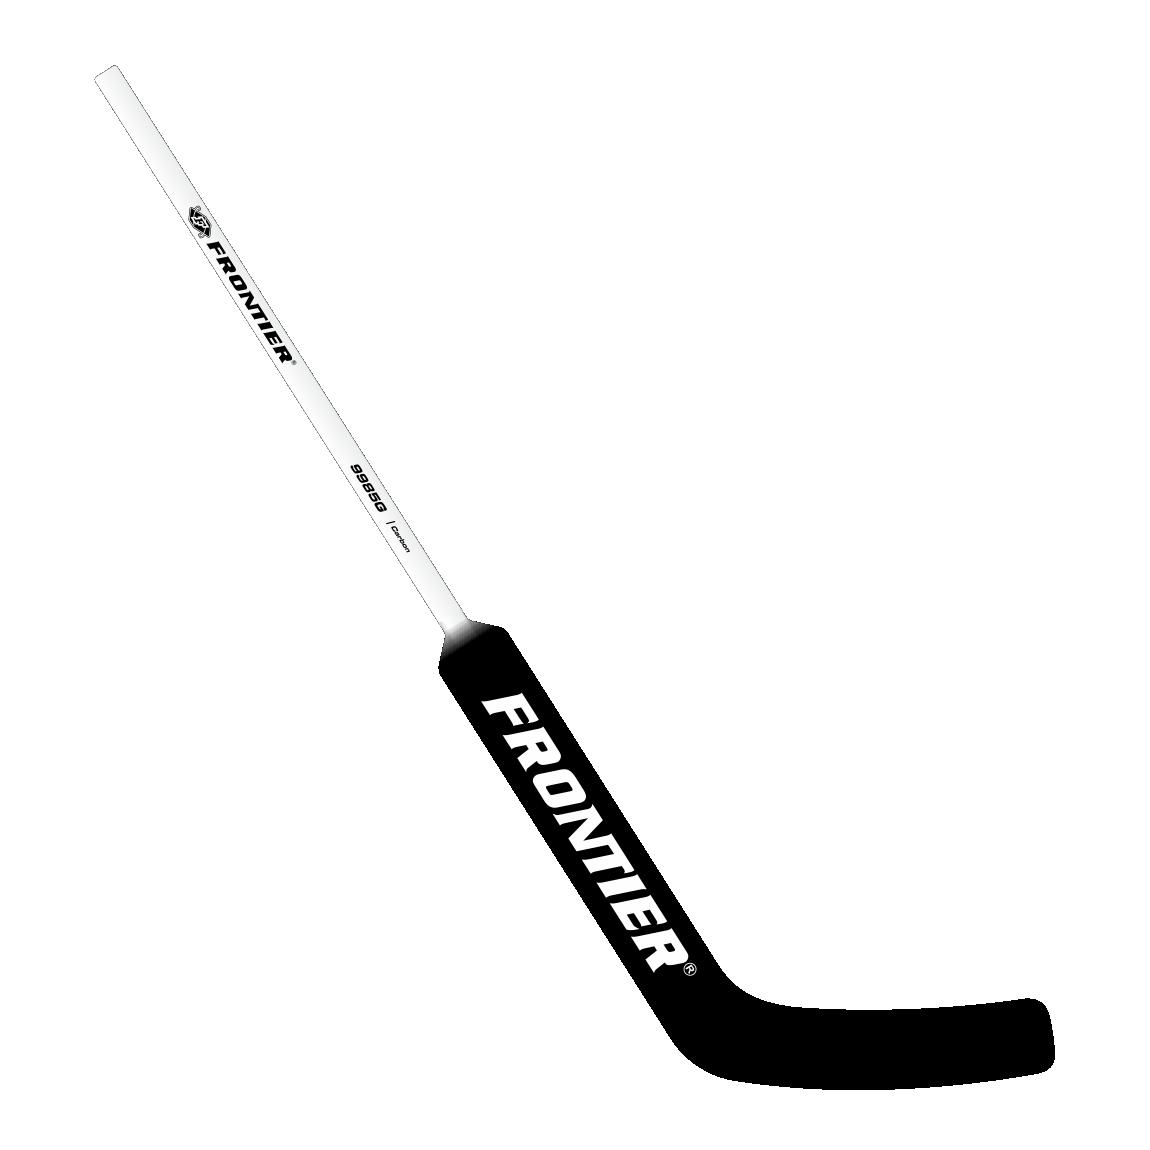 9985g Carbon Foam Core Goalie Stick Frontier Goalie Stick